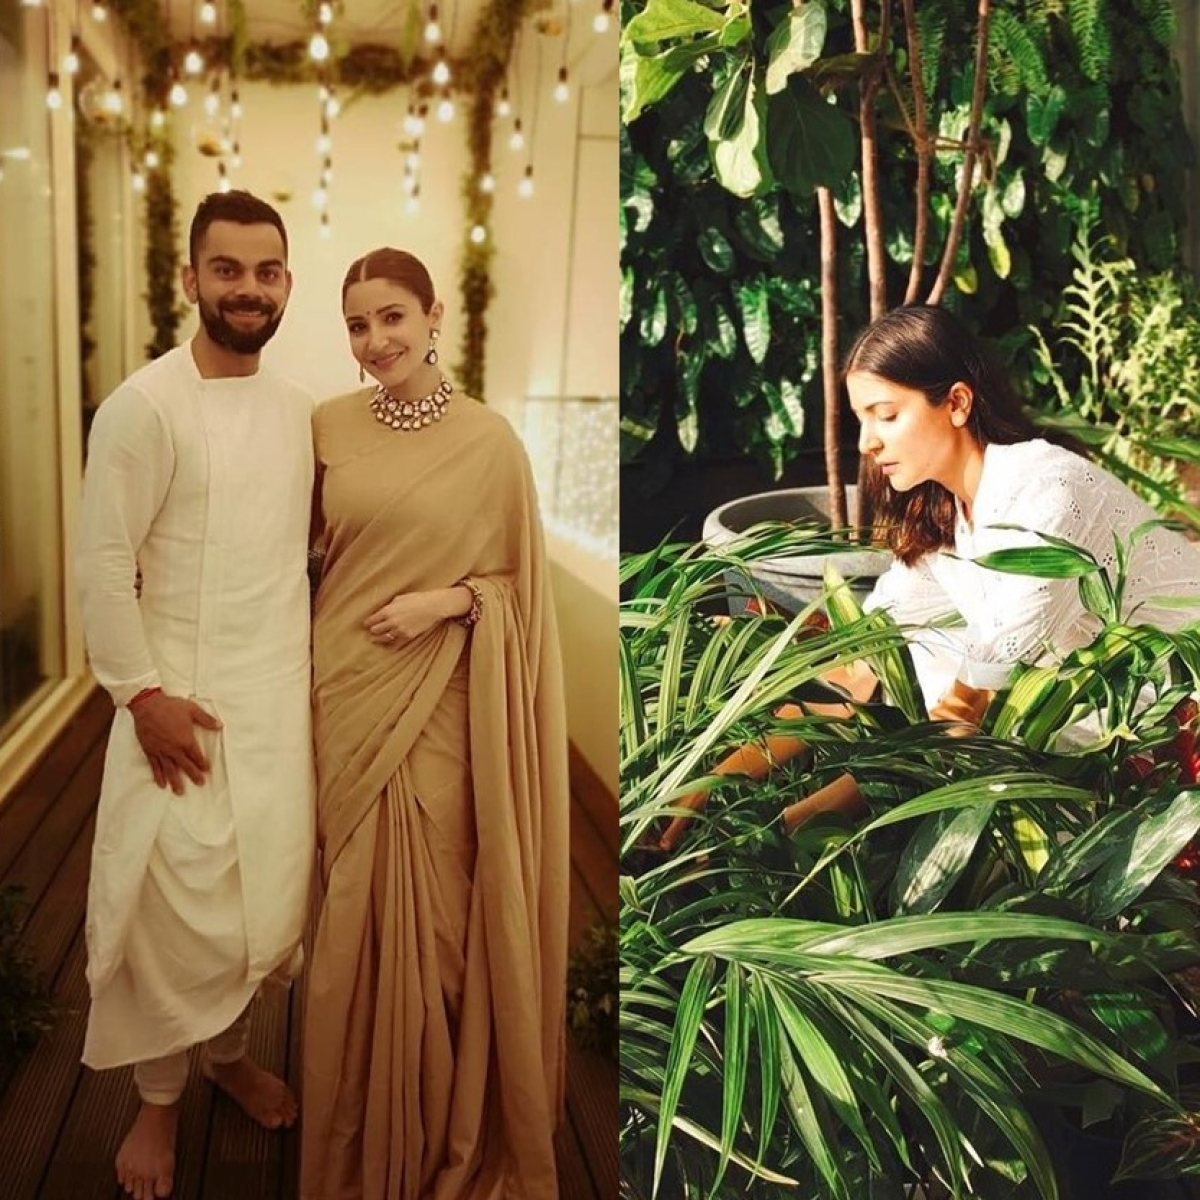 In Pics: Check out Anushka Sharma and Virat Kohli's luxurious 4-bedroom apartment in Worli, Mumbai